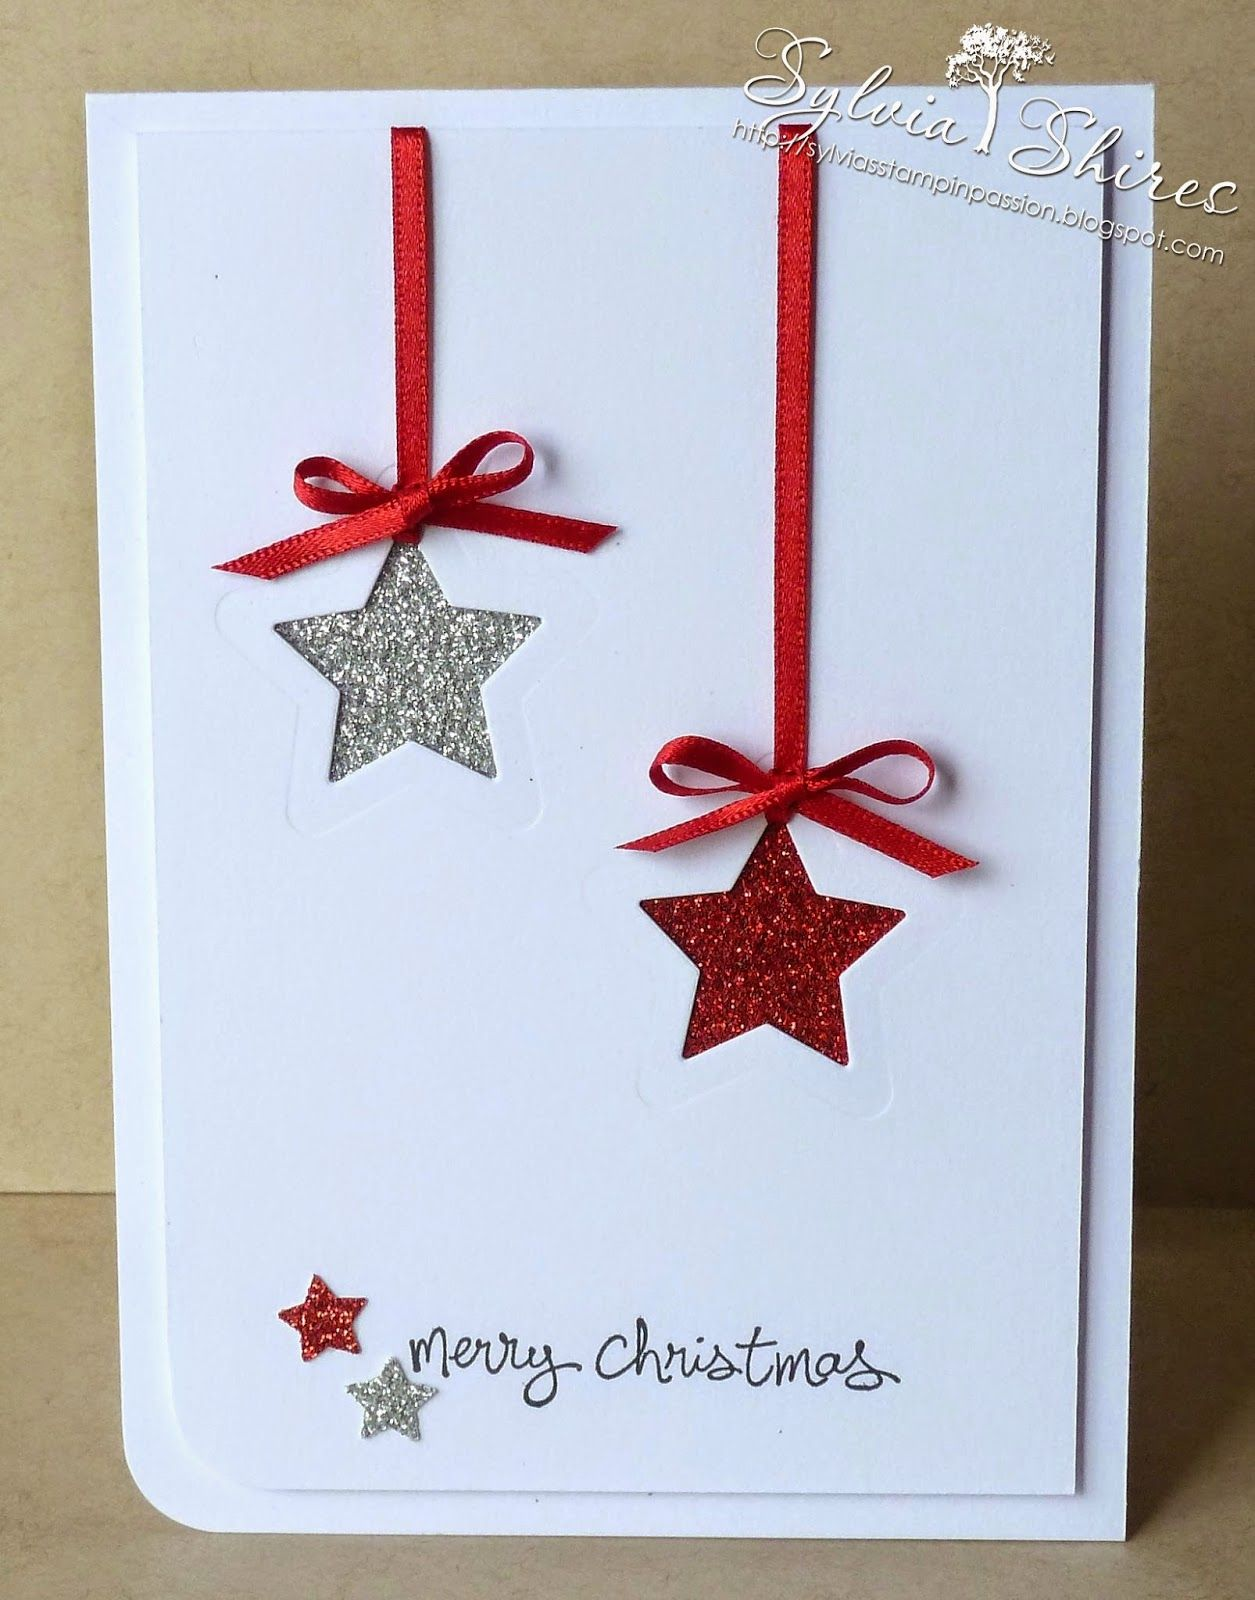 SYLVIA'S STAMPIN' PASSION : CHRISTMAS CHEER AT STAMPIN UP! Star Framelits and Good Greetings